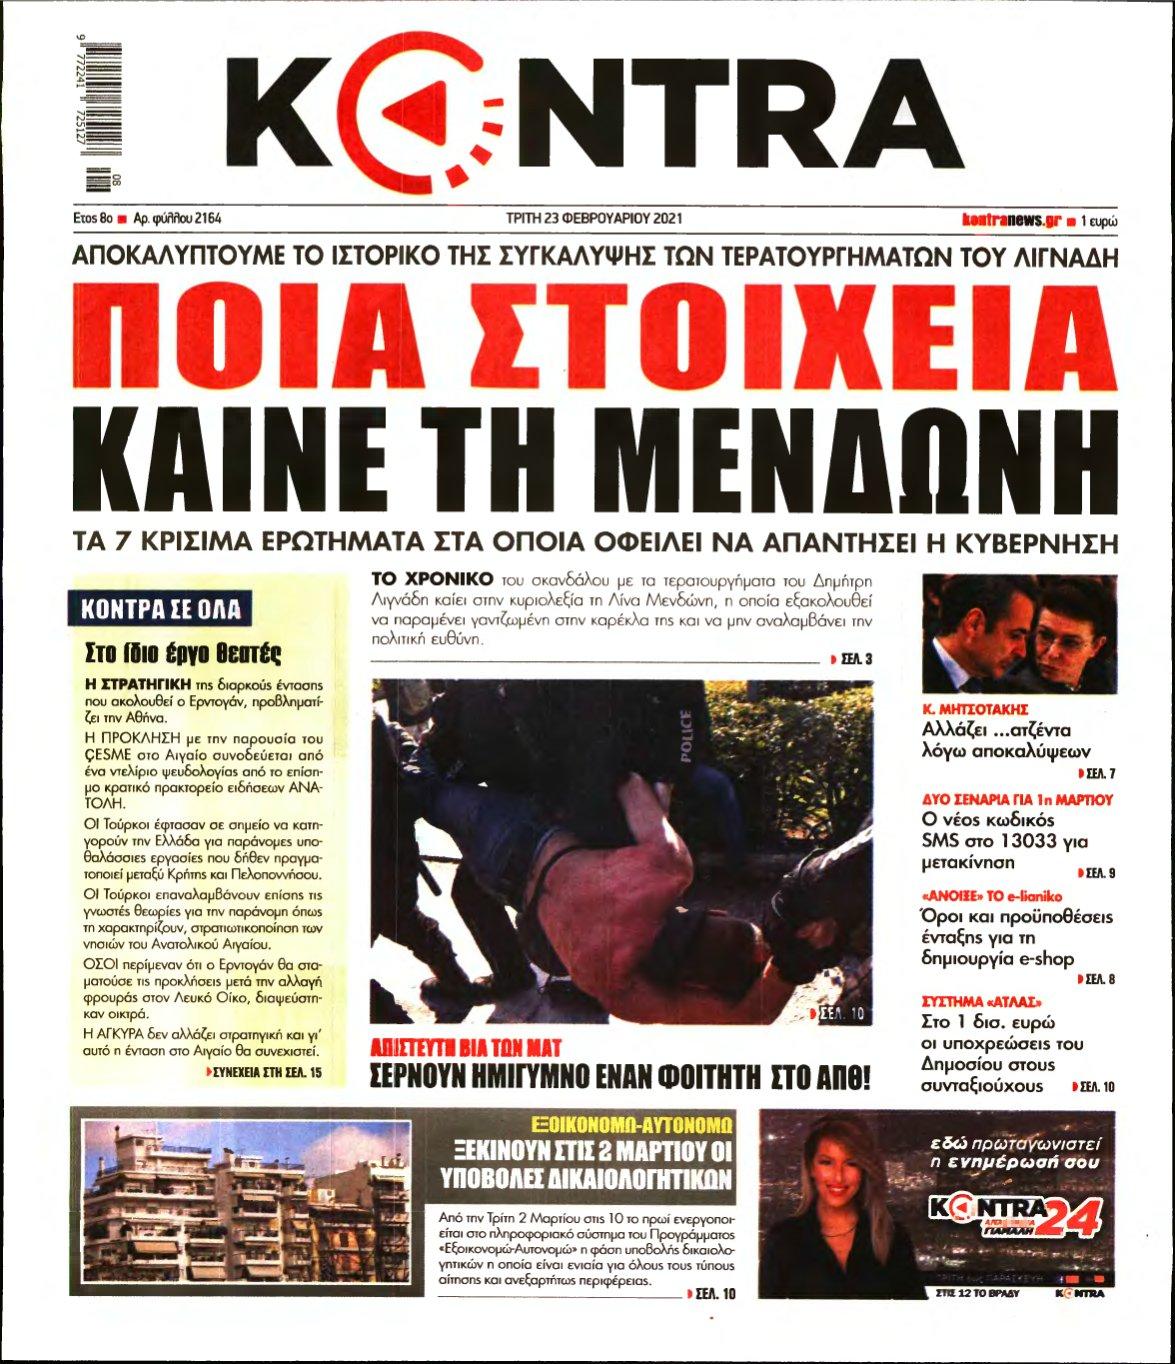 KONTRA NEWS – 23/02/2021